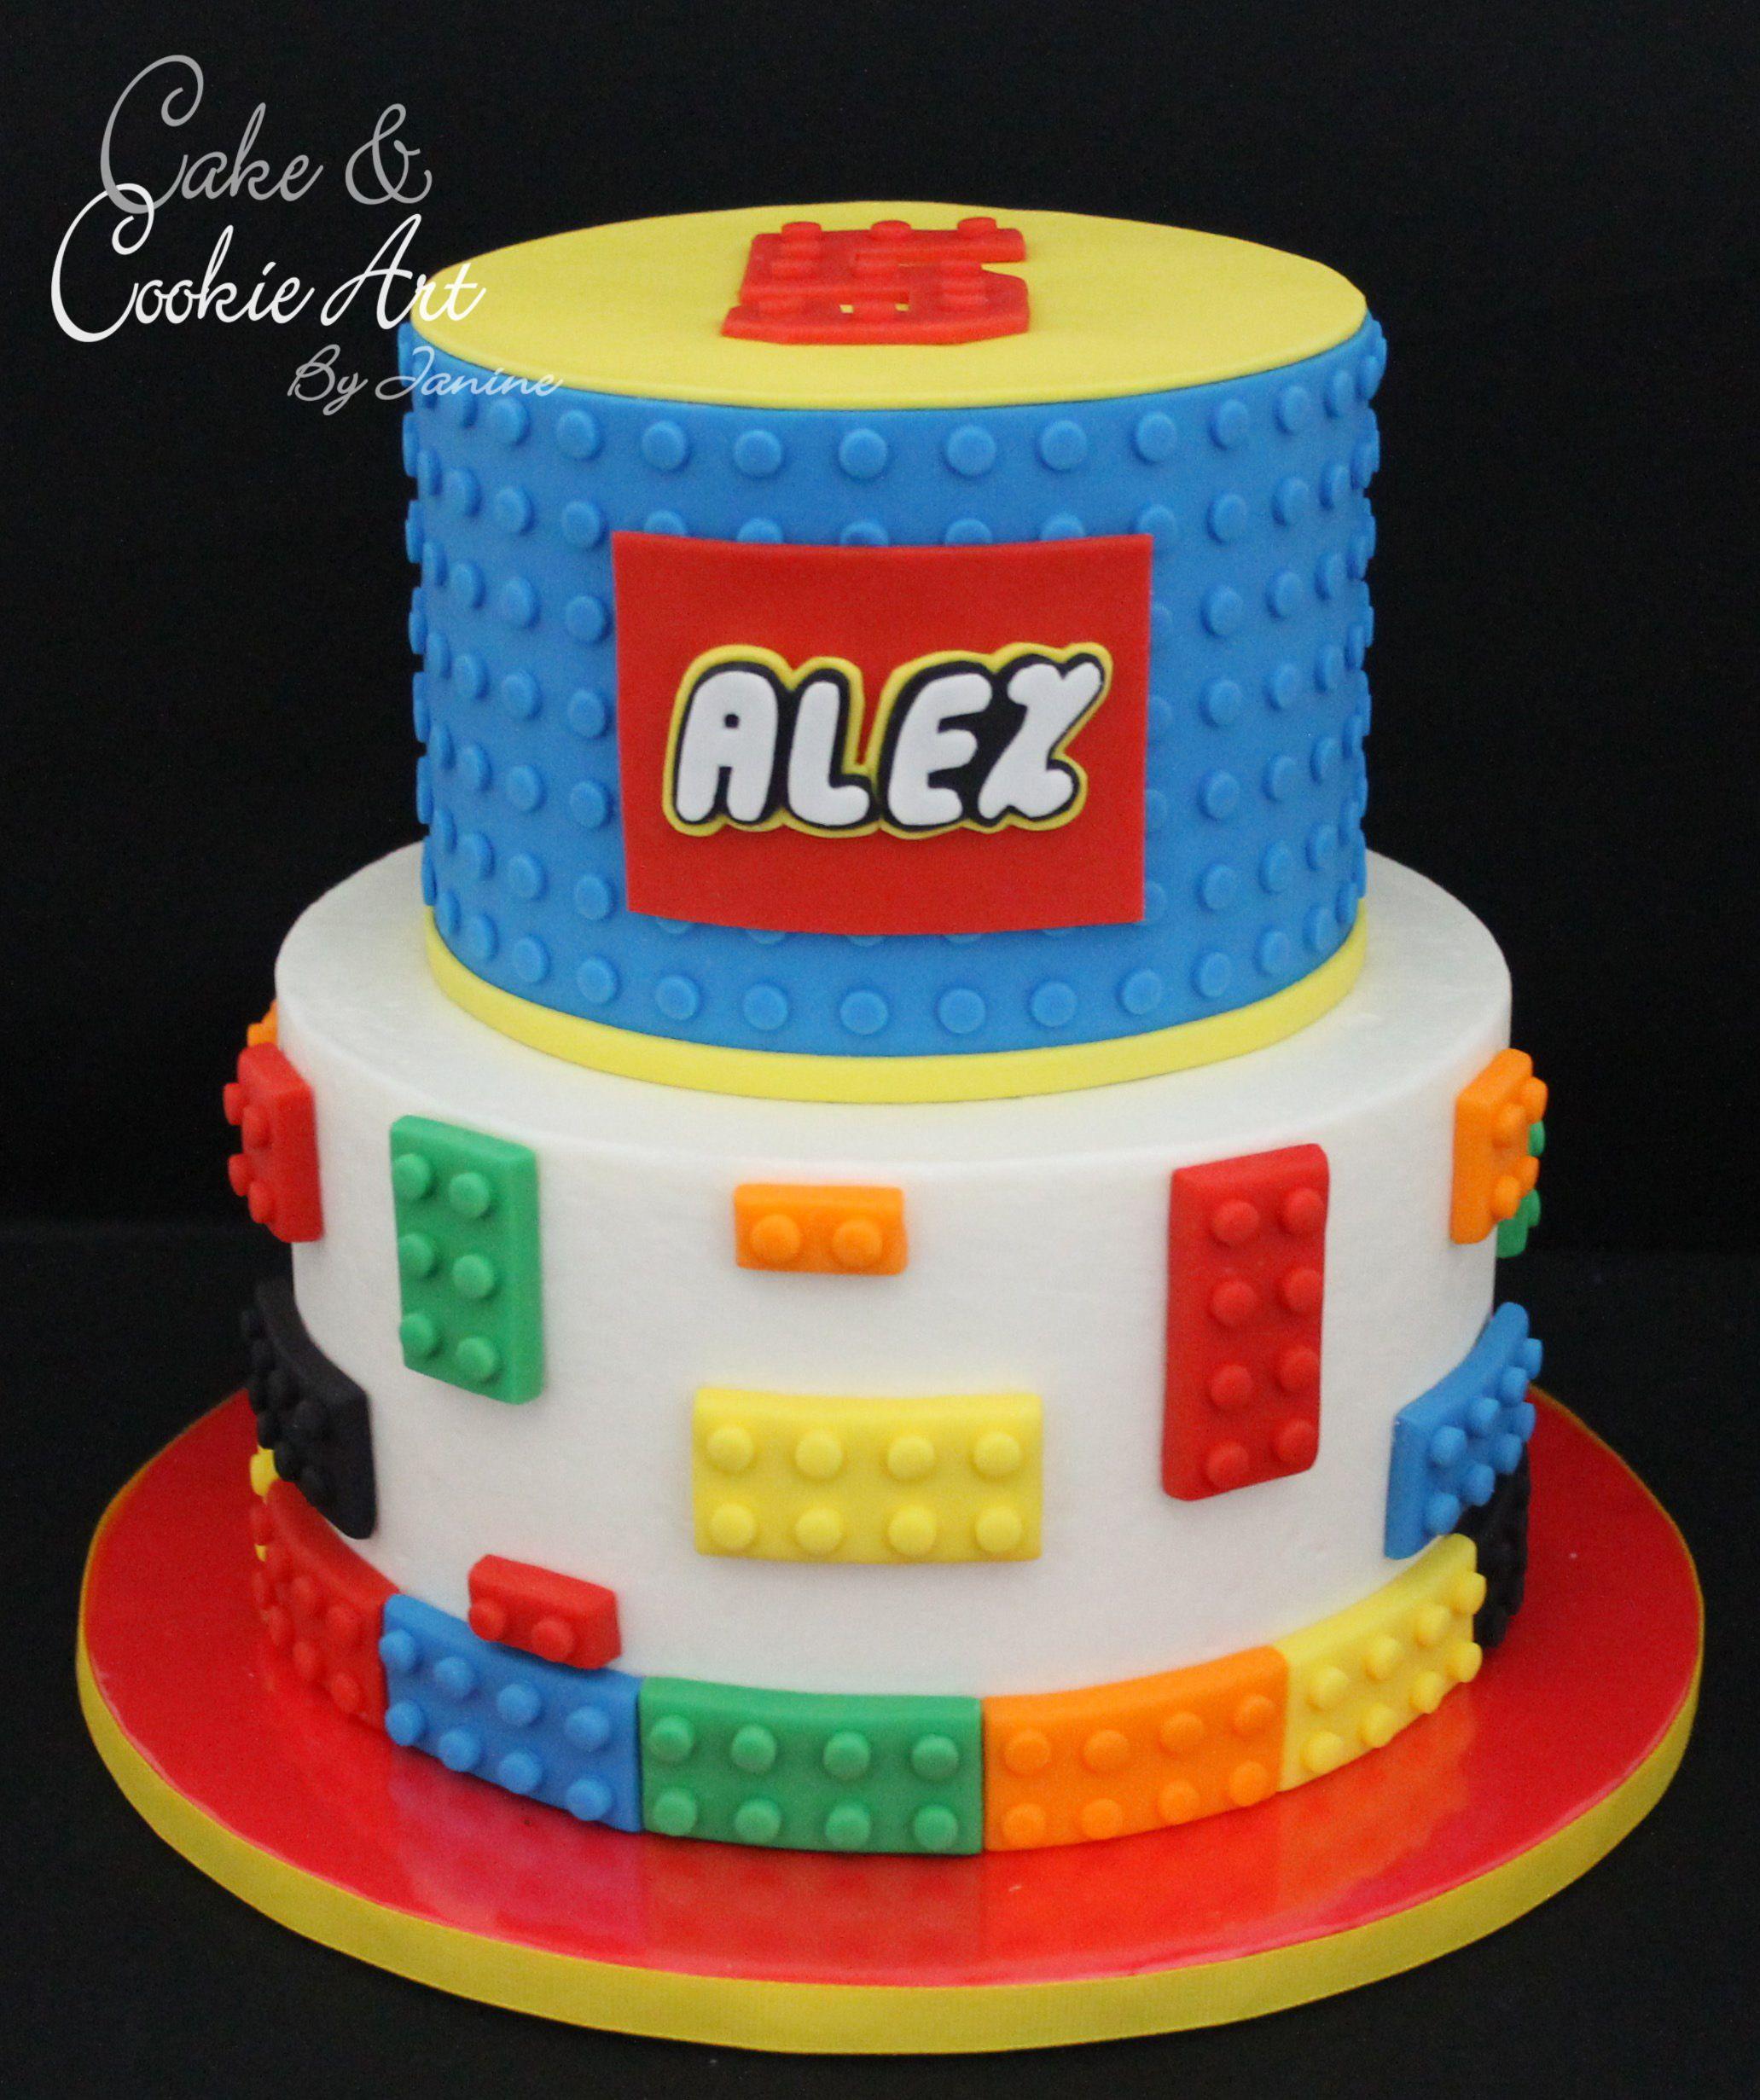 Sensational Lego Theme Cake Lego Birthday Cake Novelty Birthday Cakes Funny Birthday Cards Online Fluifree Goldxyz